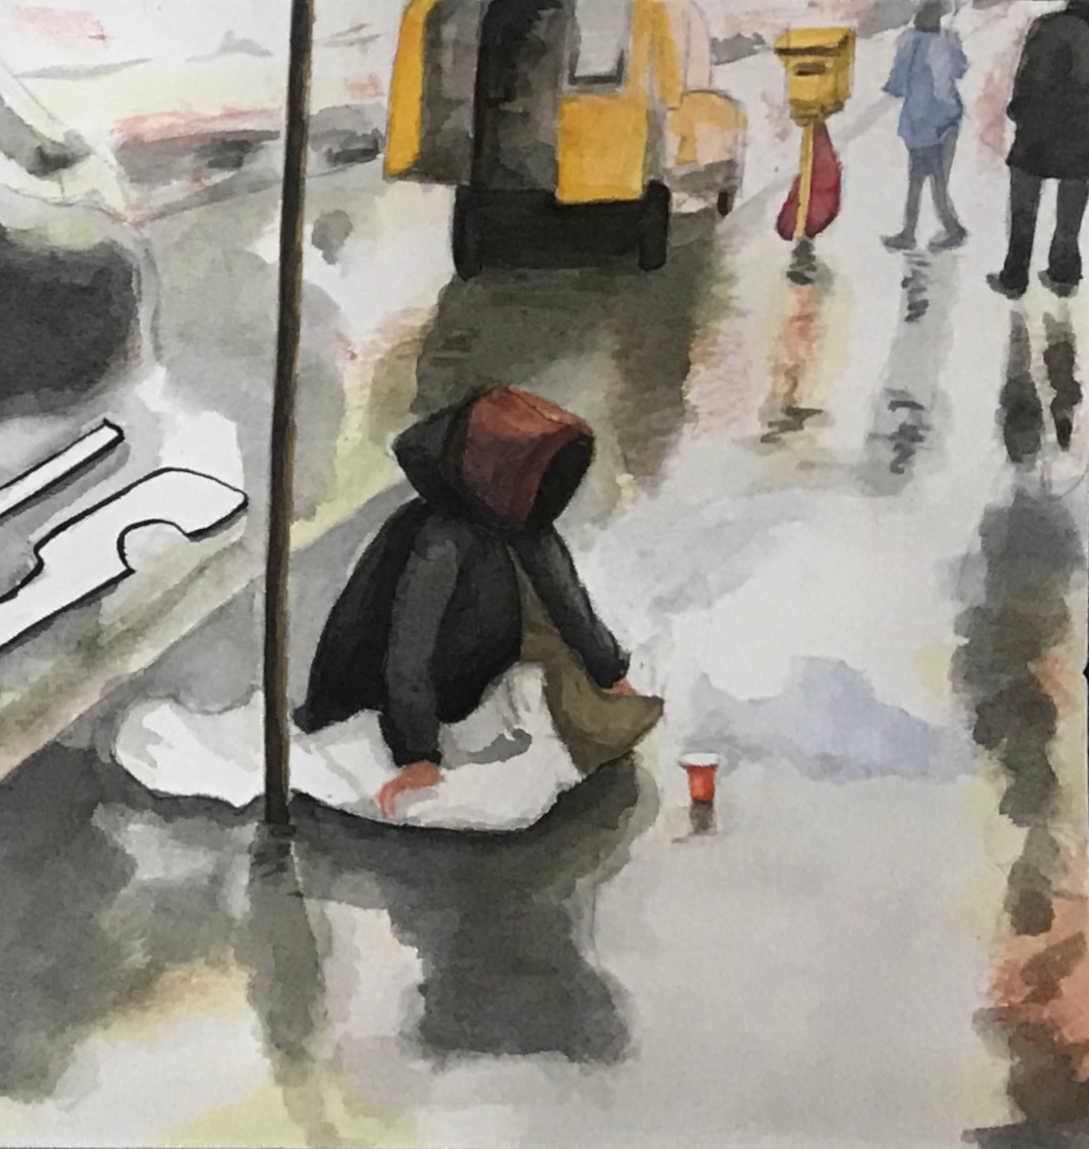 Paris, Dortoir des solitudes - 6